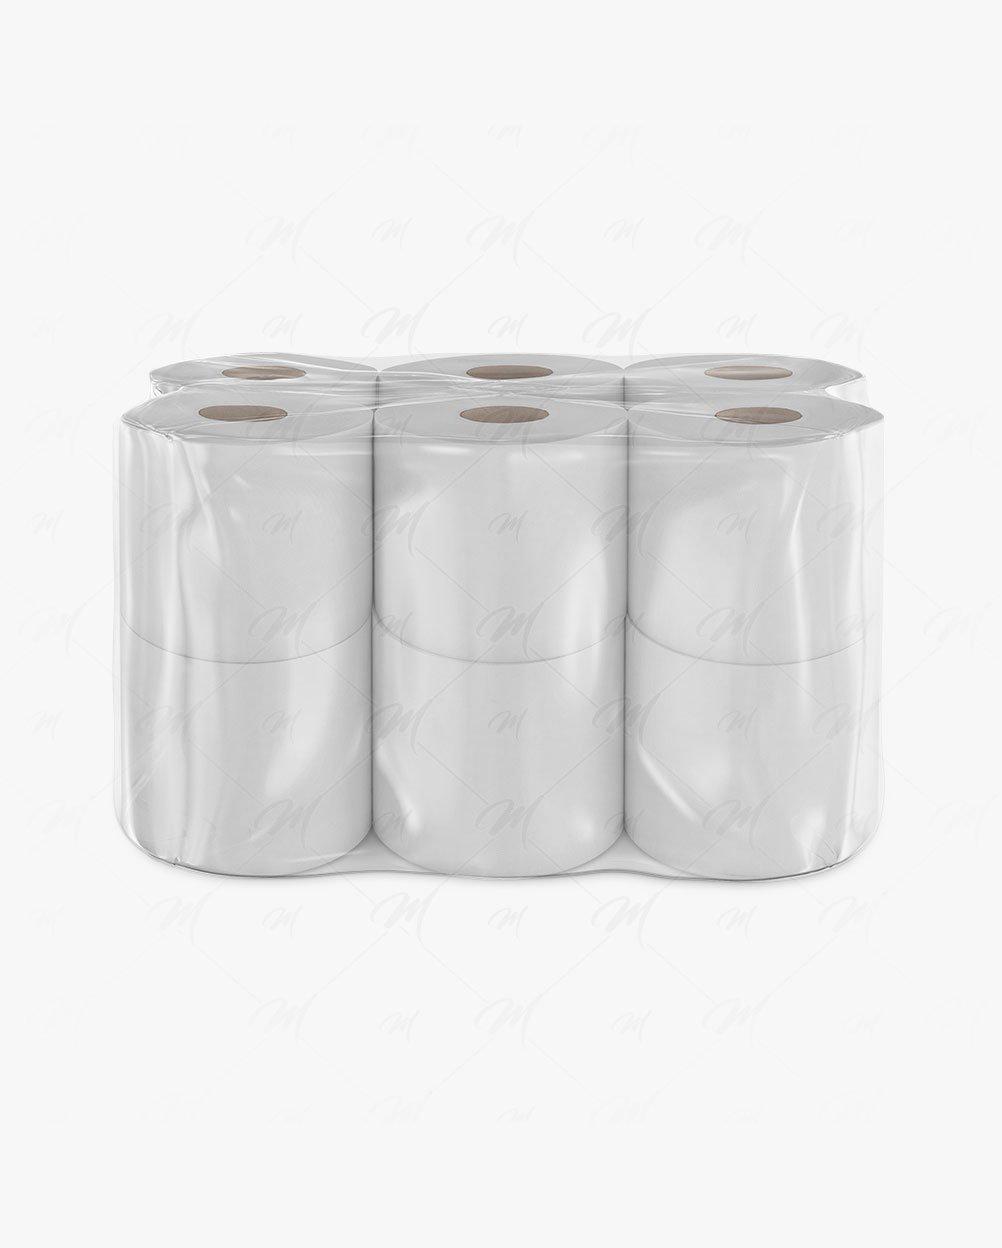 mockup-embalagem-papel-higienico-12-rolos